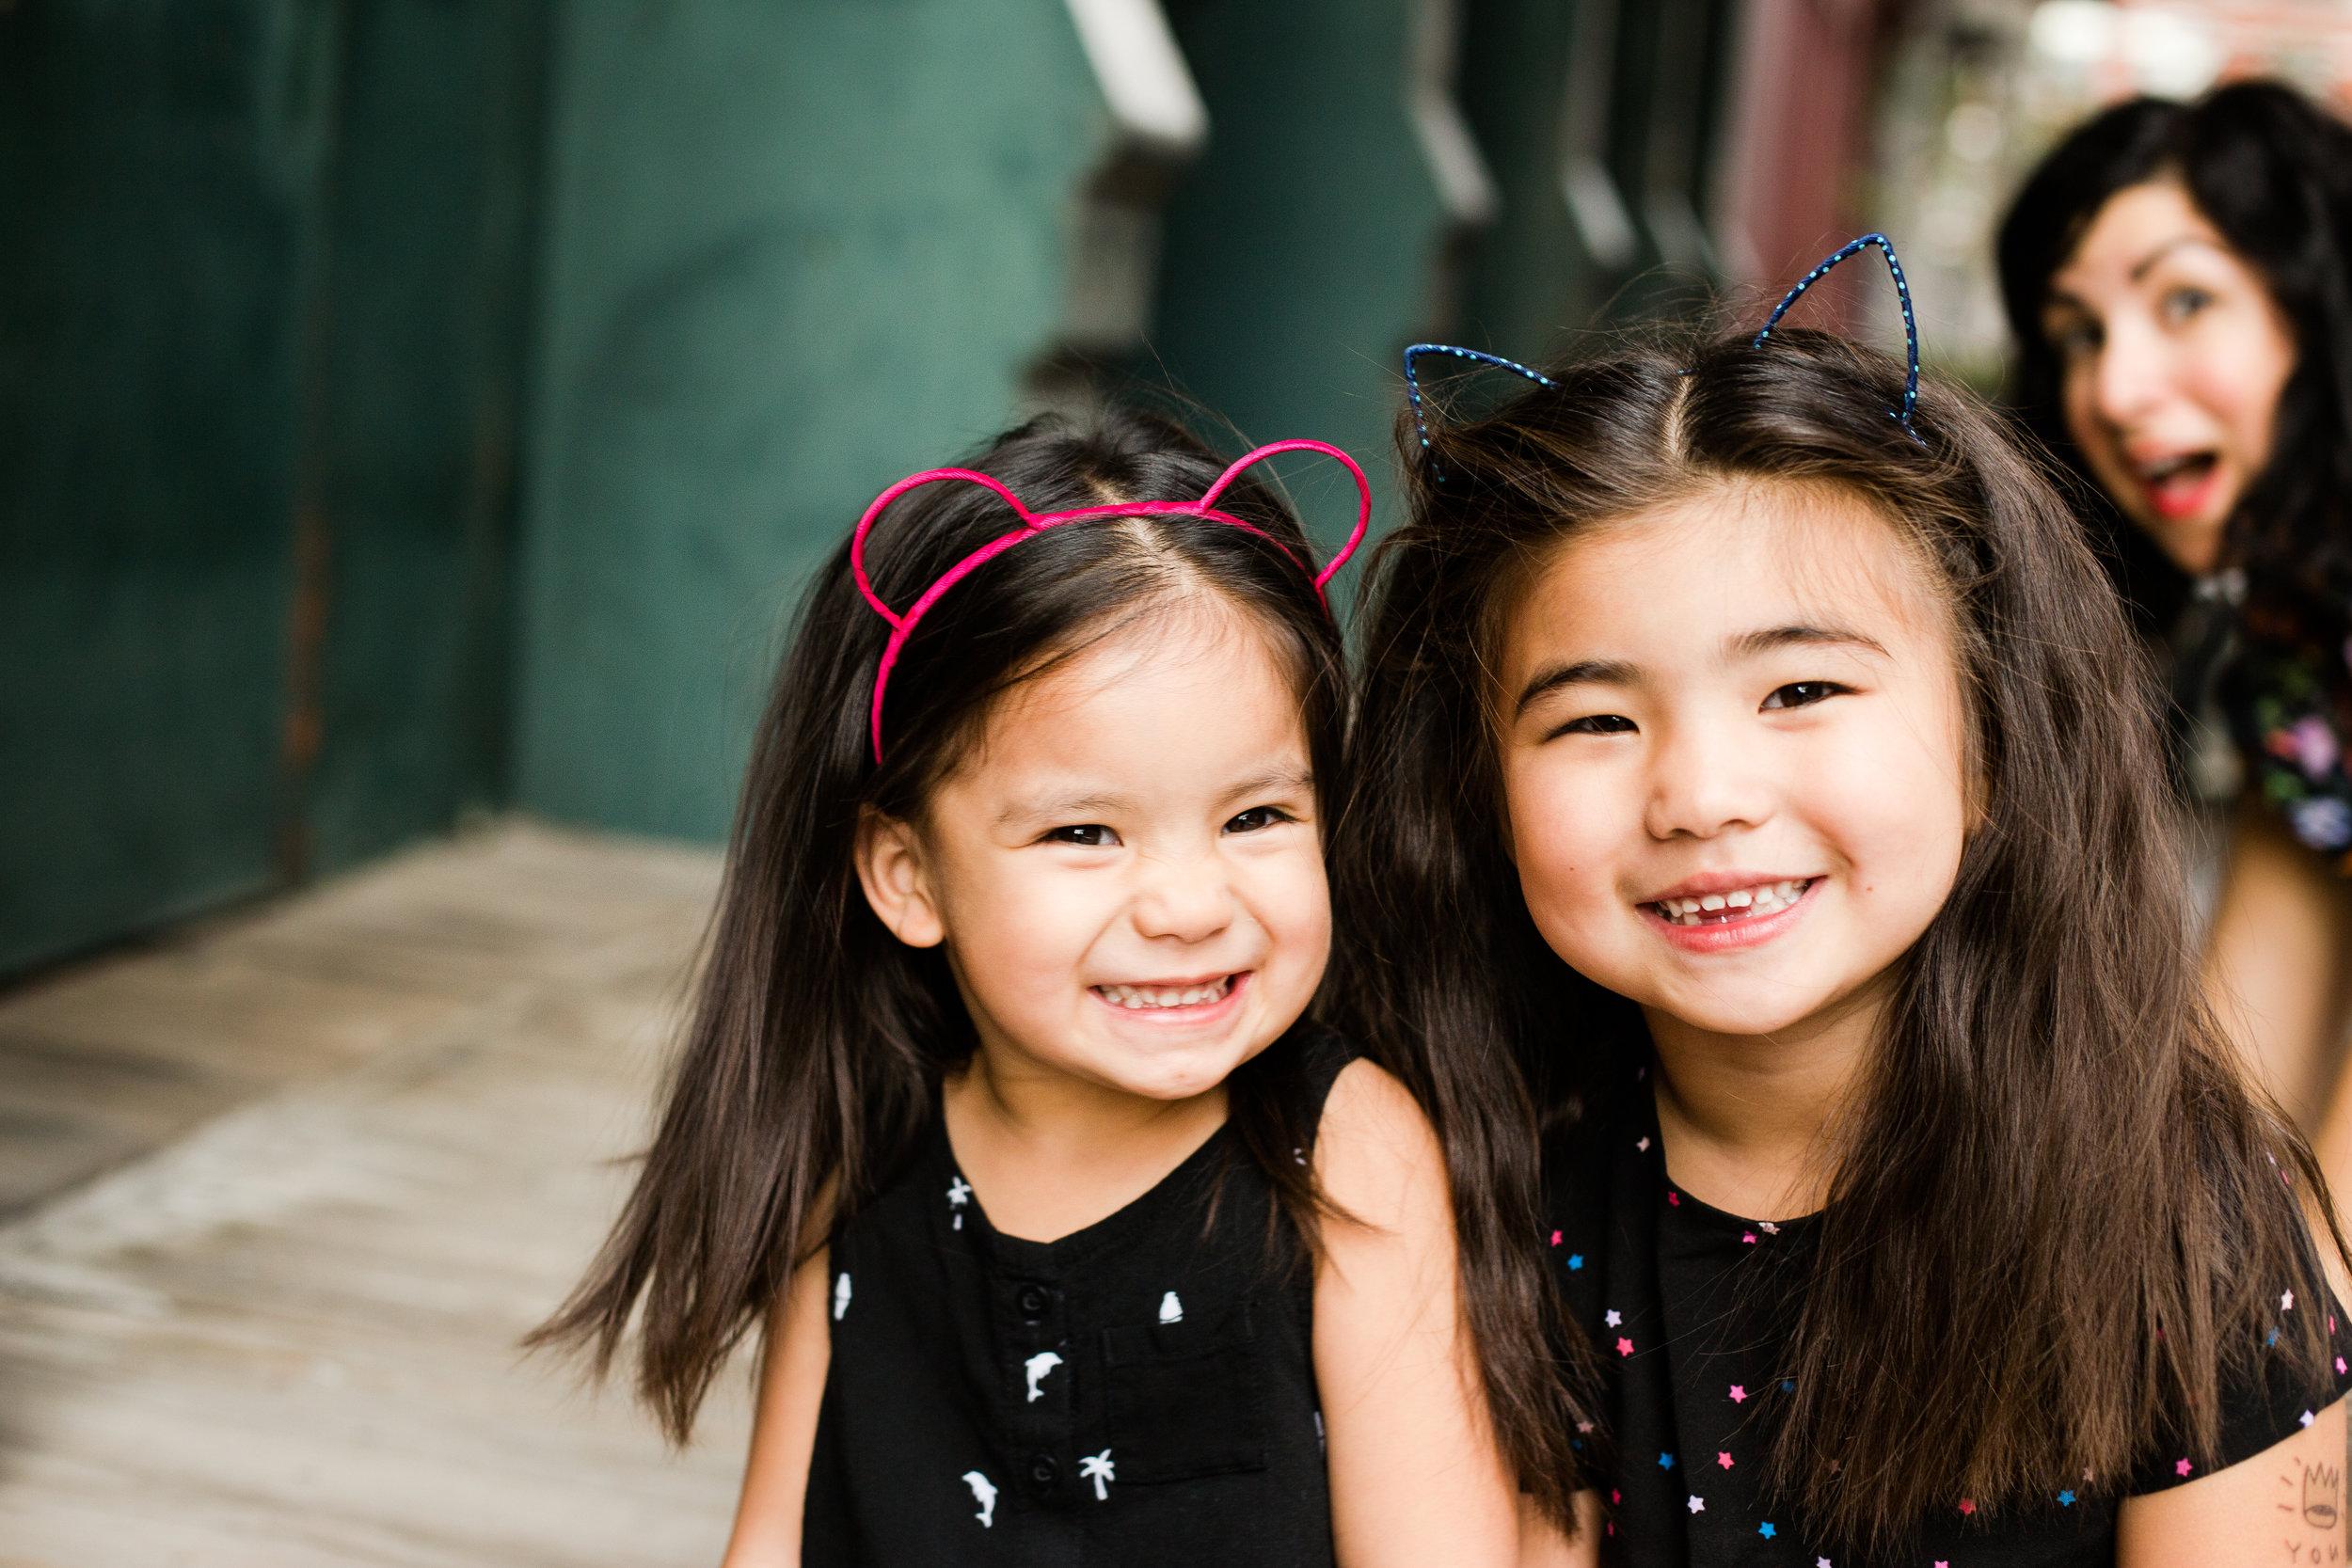 lissiephoto_loomis_nyc_family_photography29.JPG